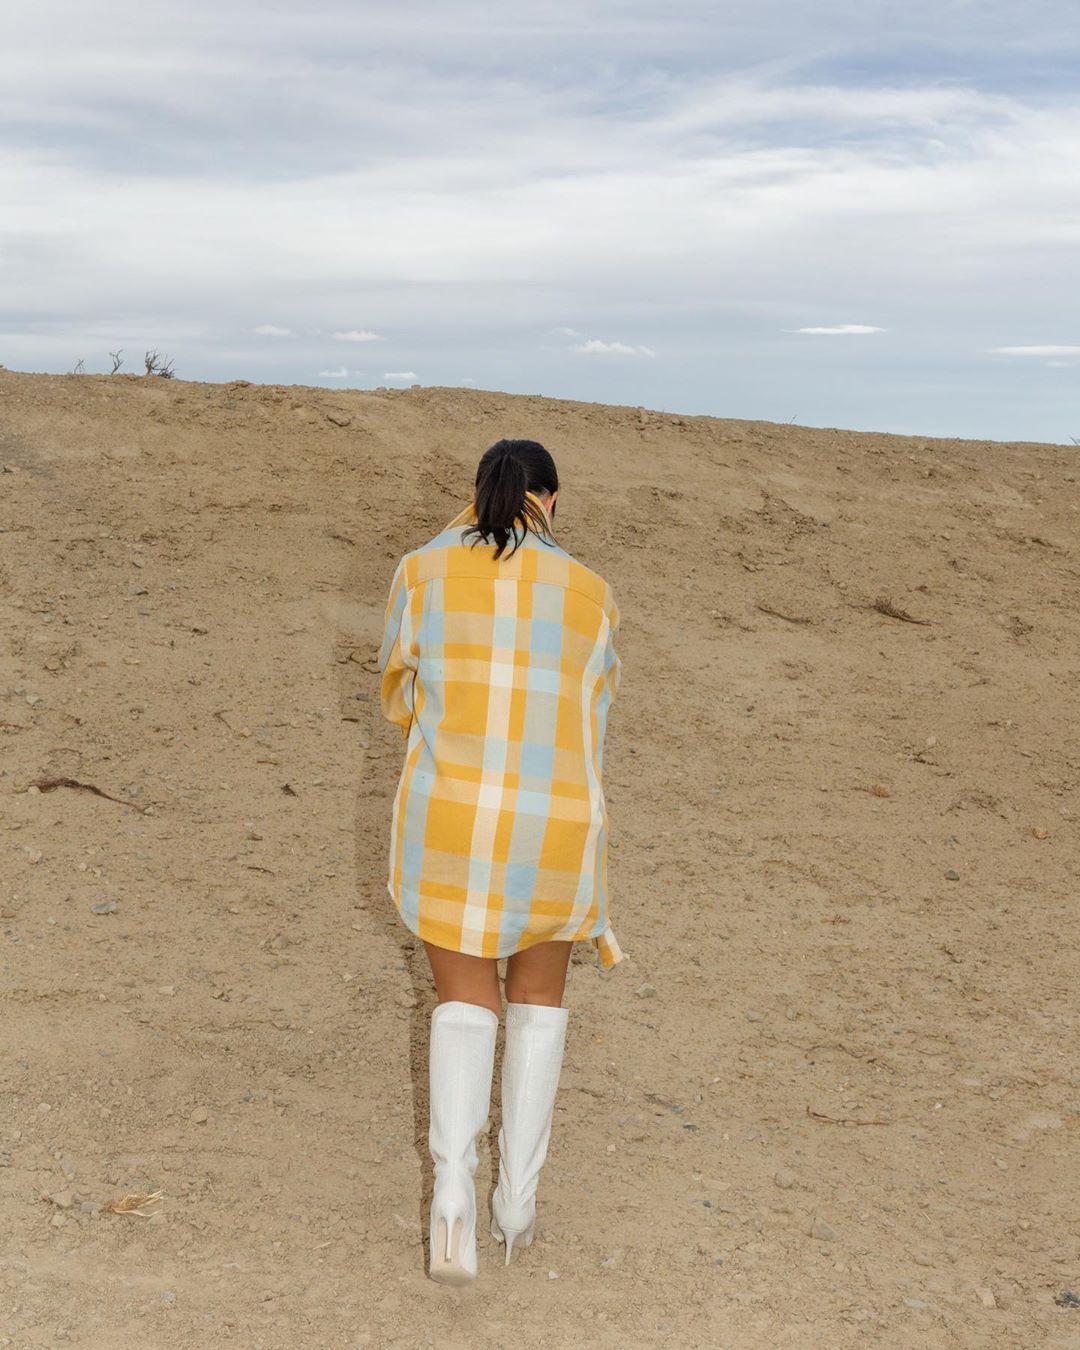 Kourtney Kardashian donning a oversized yellow checks shirt with extra long sleeves and shirt collar